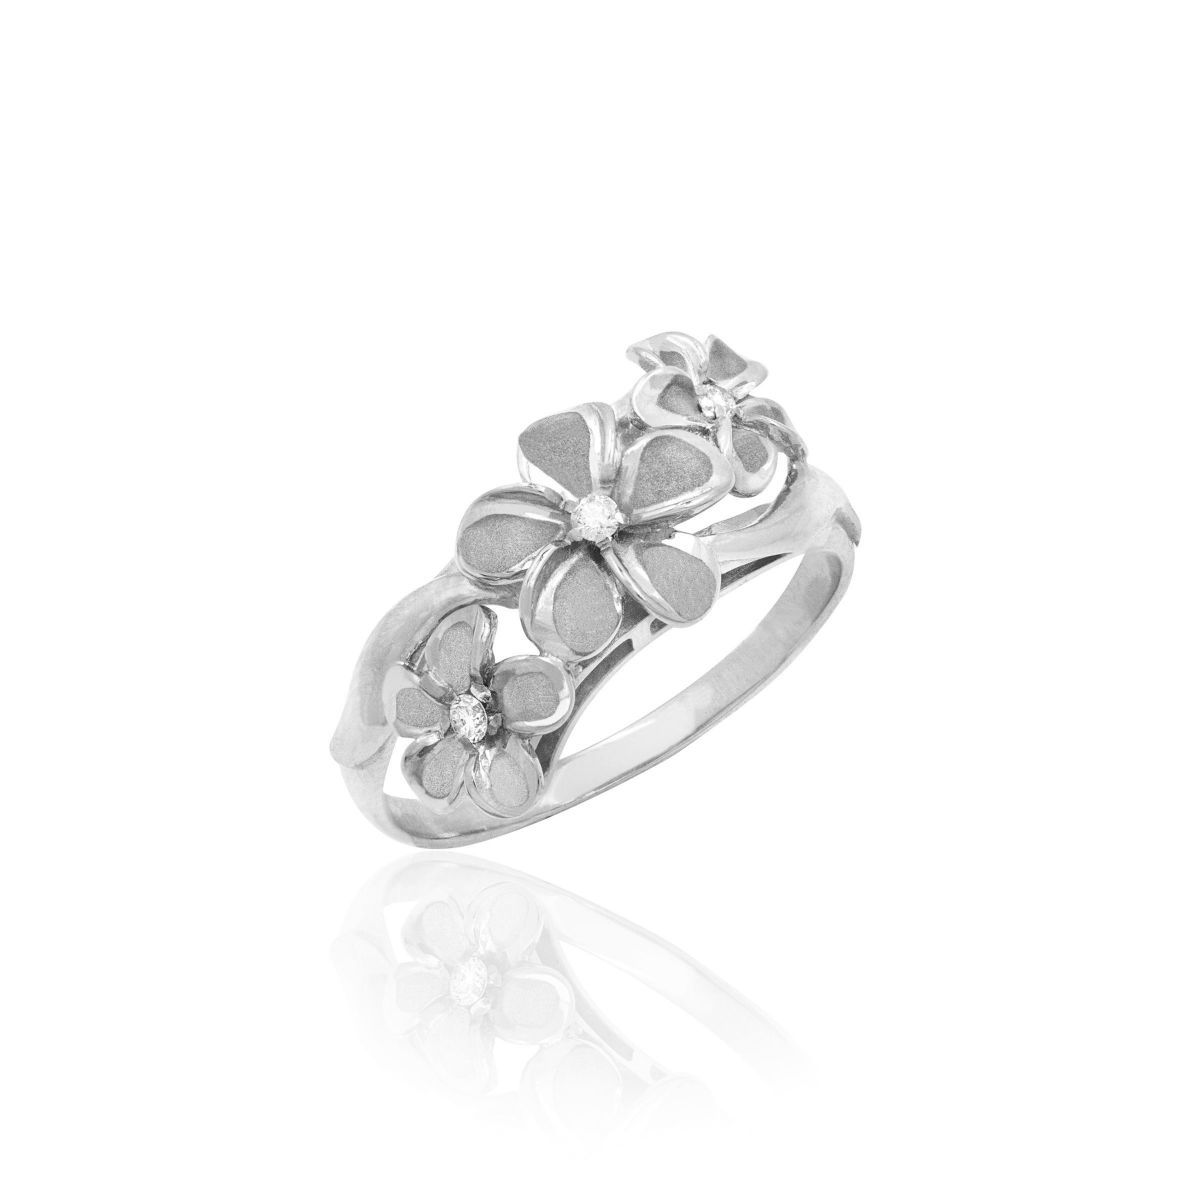 White Gold Queen Plumeria Triple Flower Diamond Ring Flower Diamond Ring White Gold Rings Jewelry